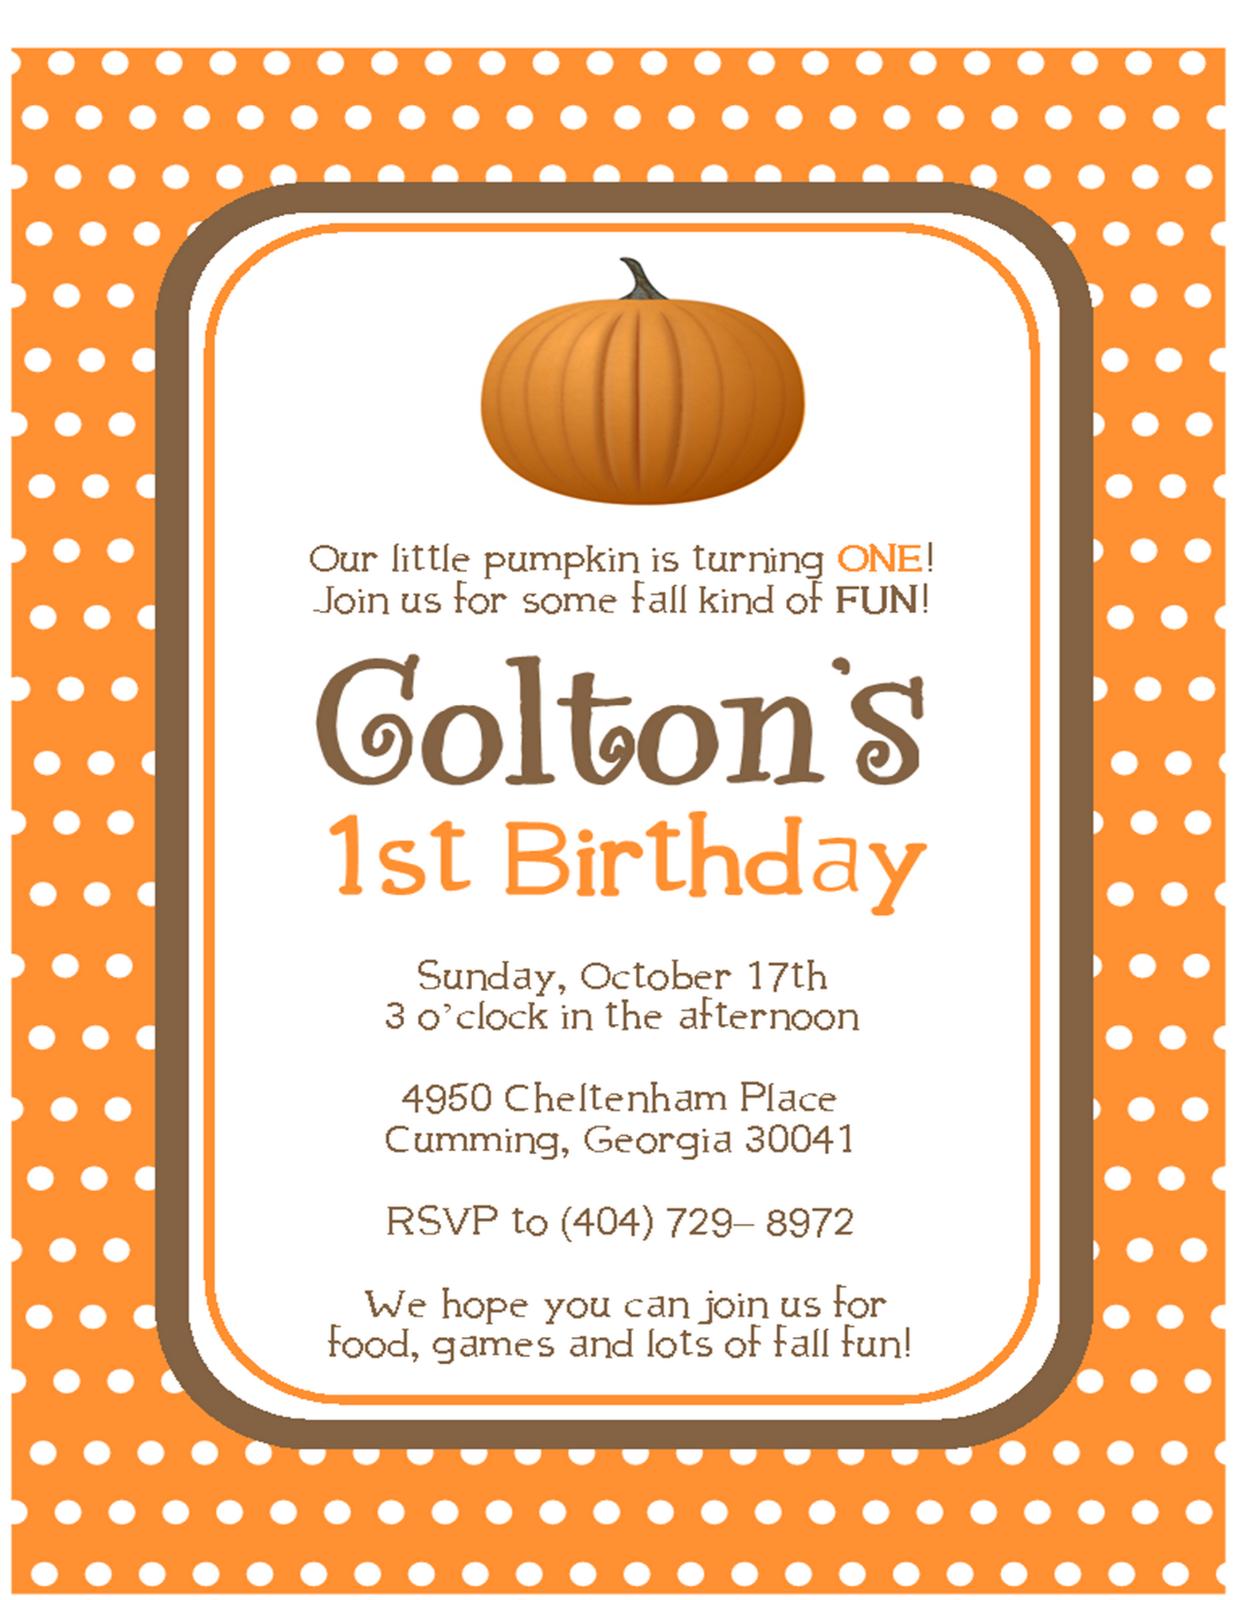 Cute idea for October birthday invitations